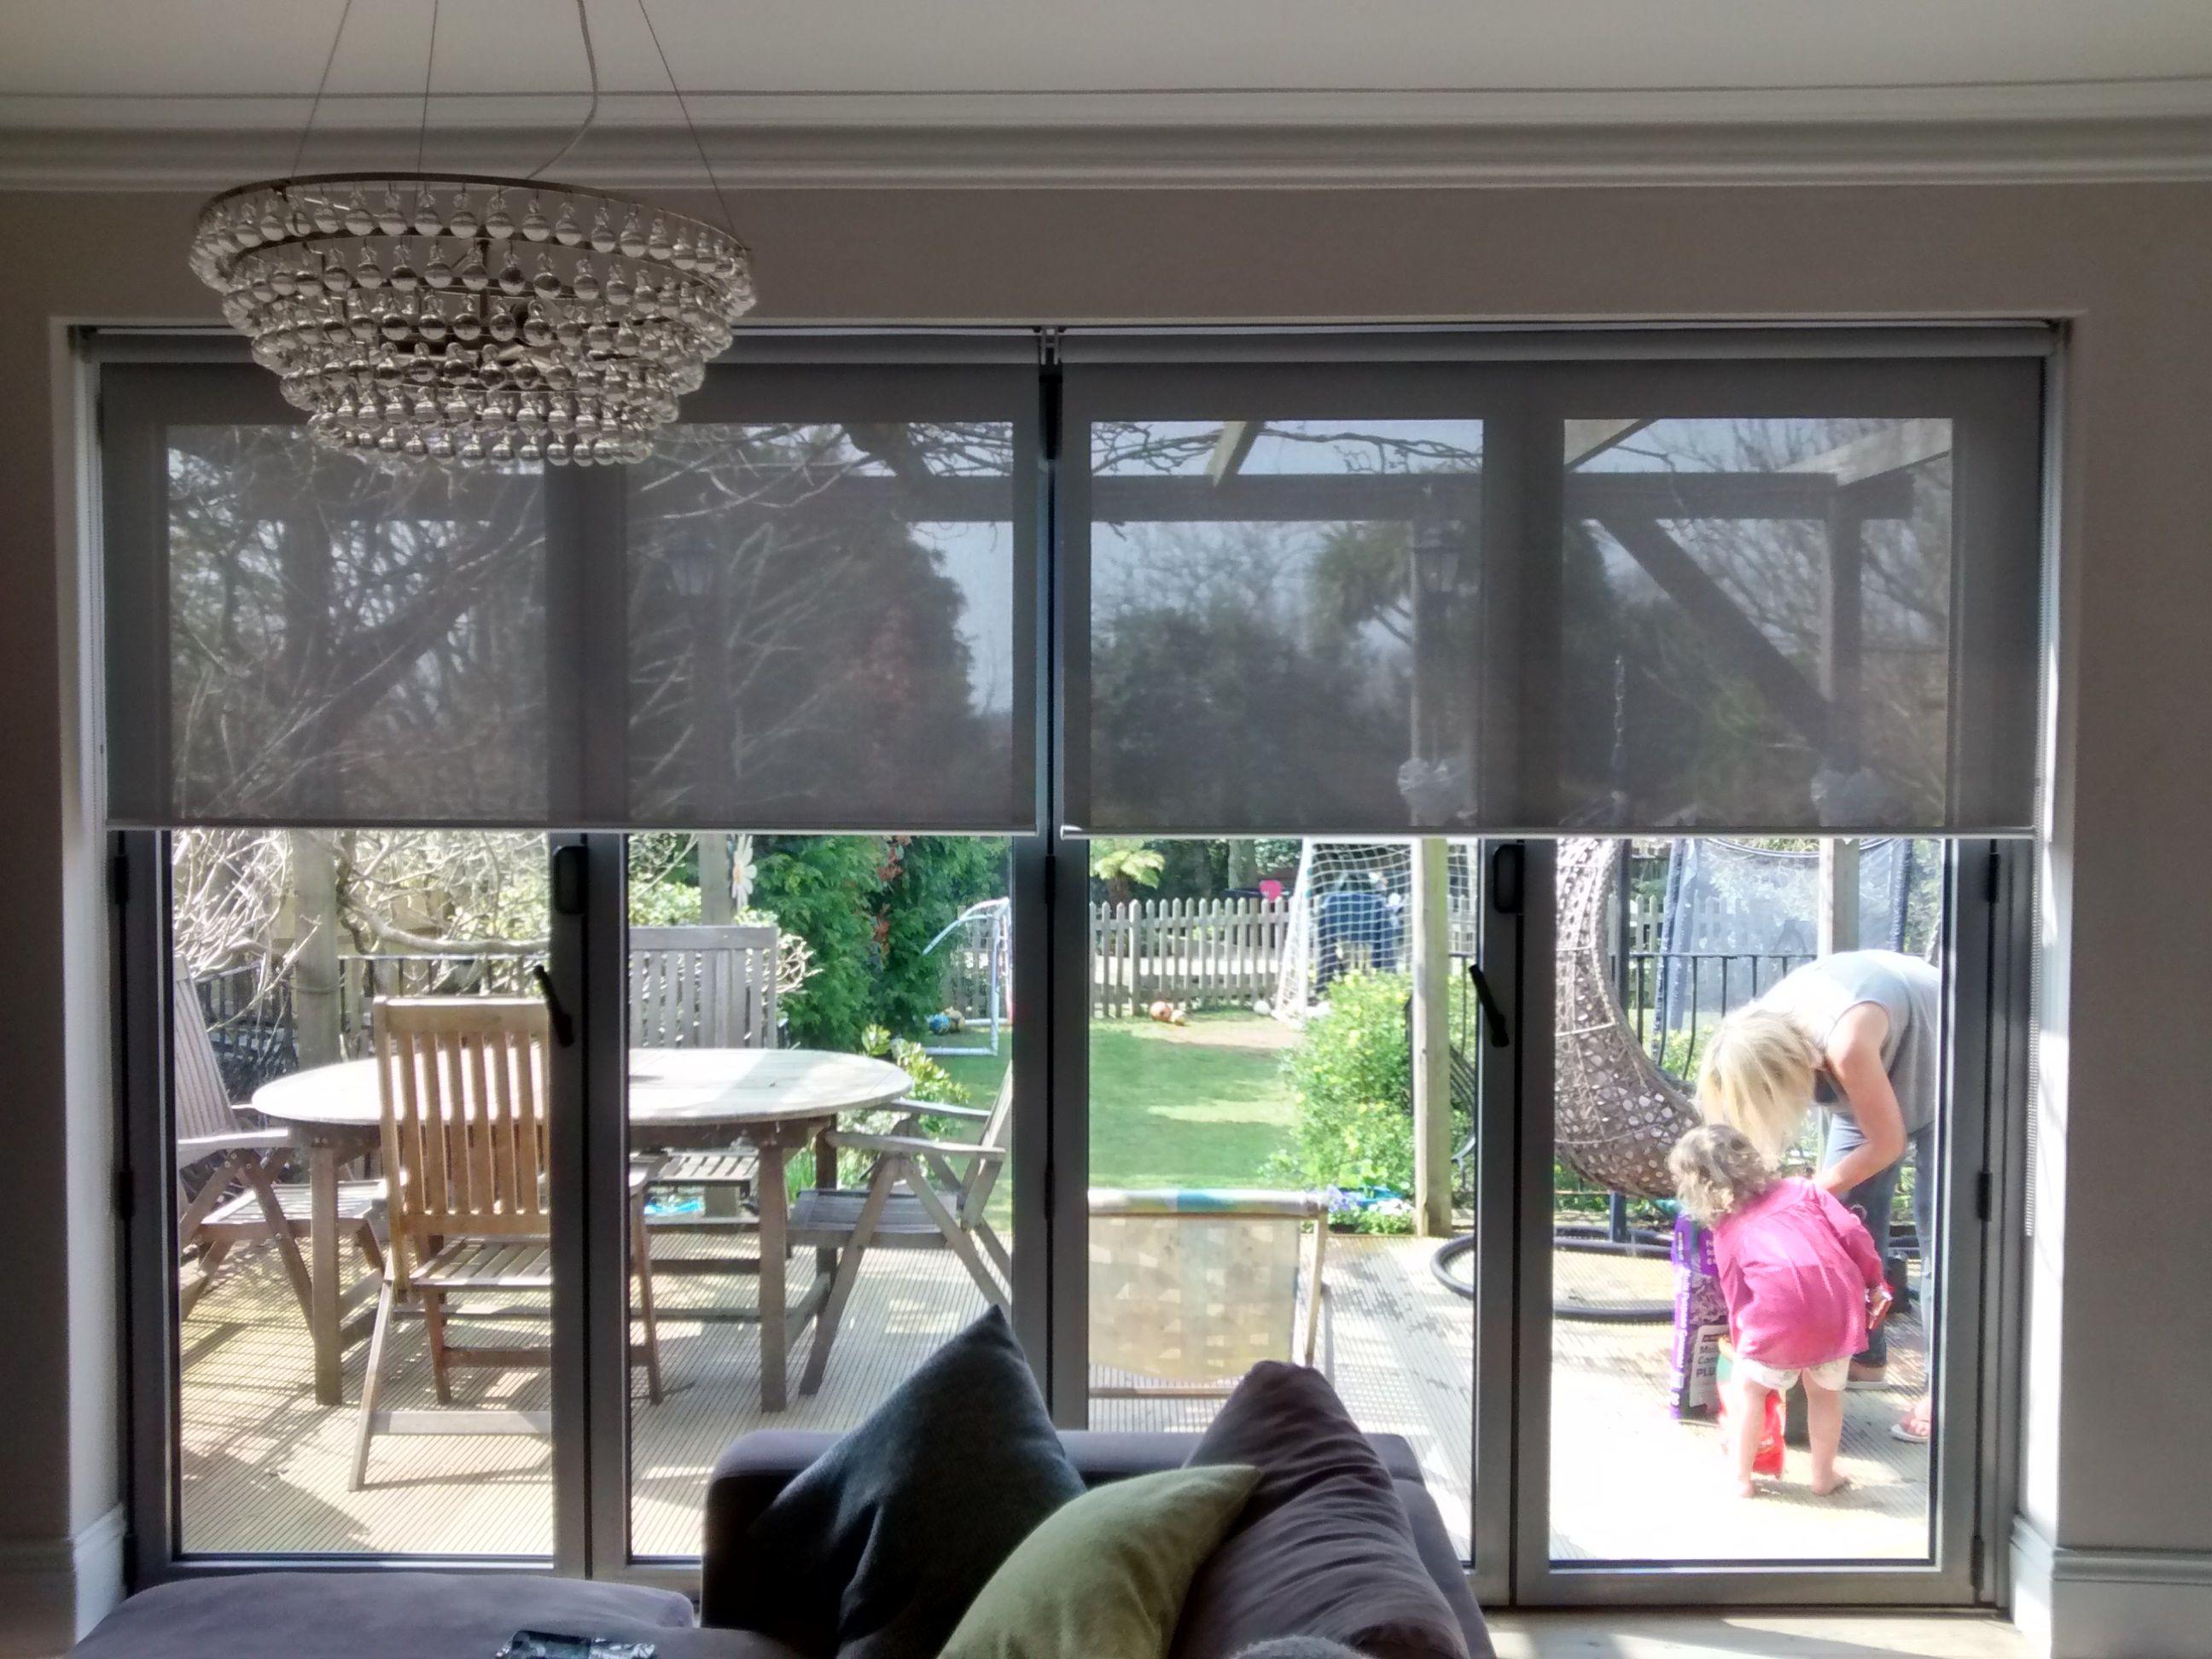 Sunscreen roller blinds over bifold doors in living room Supplied